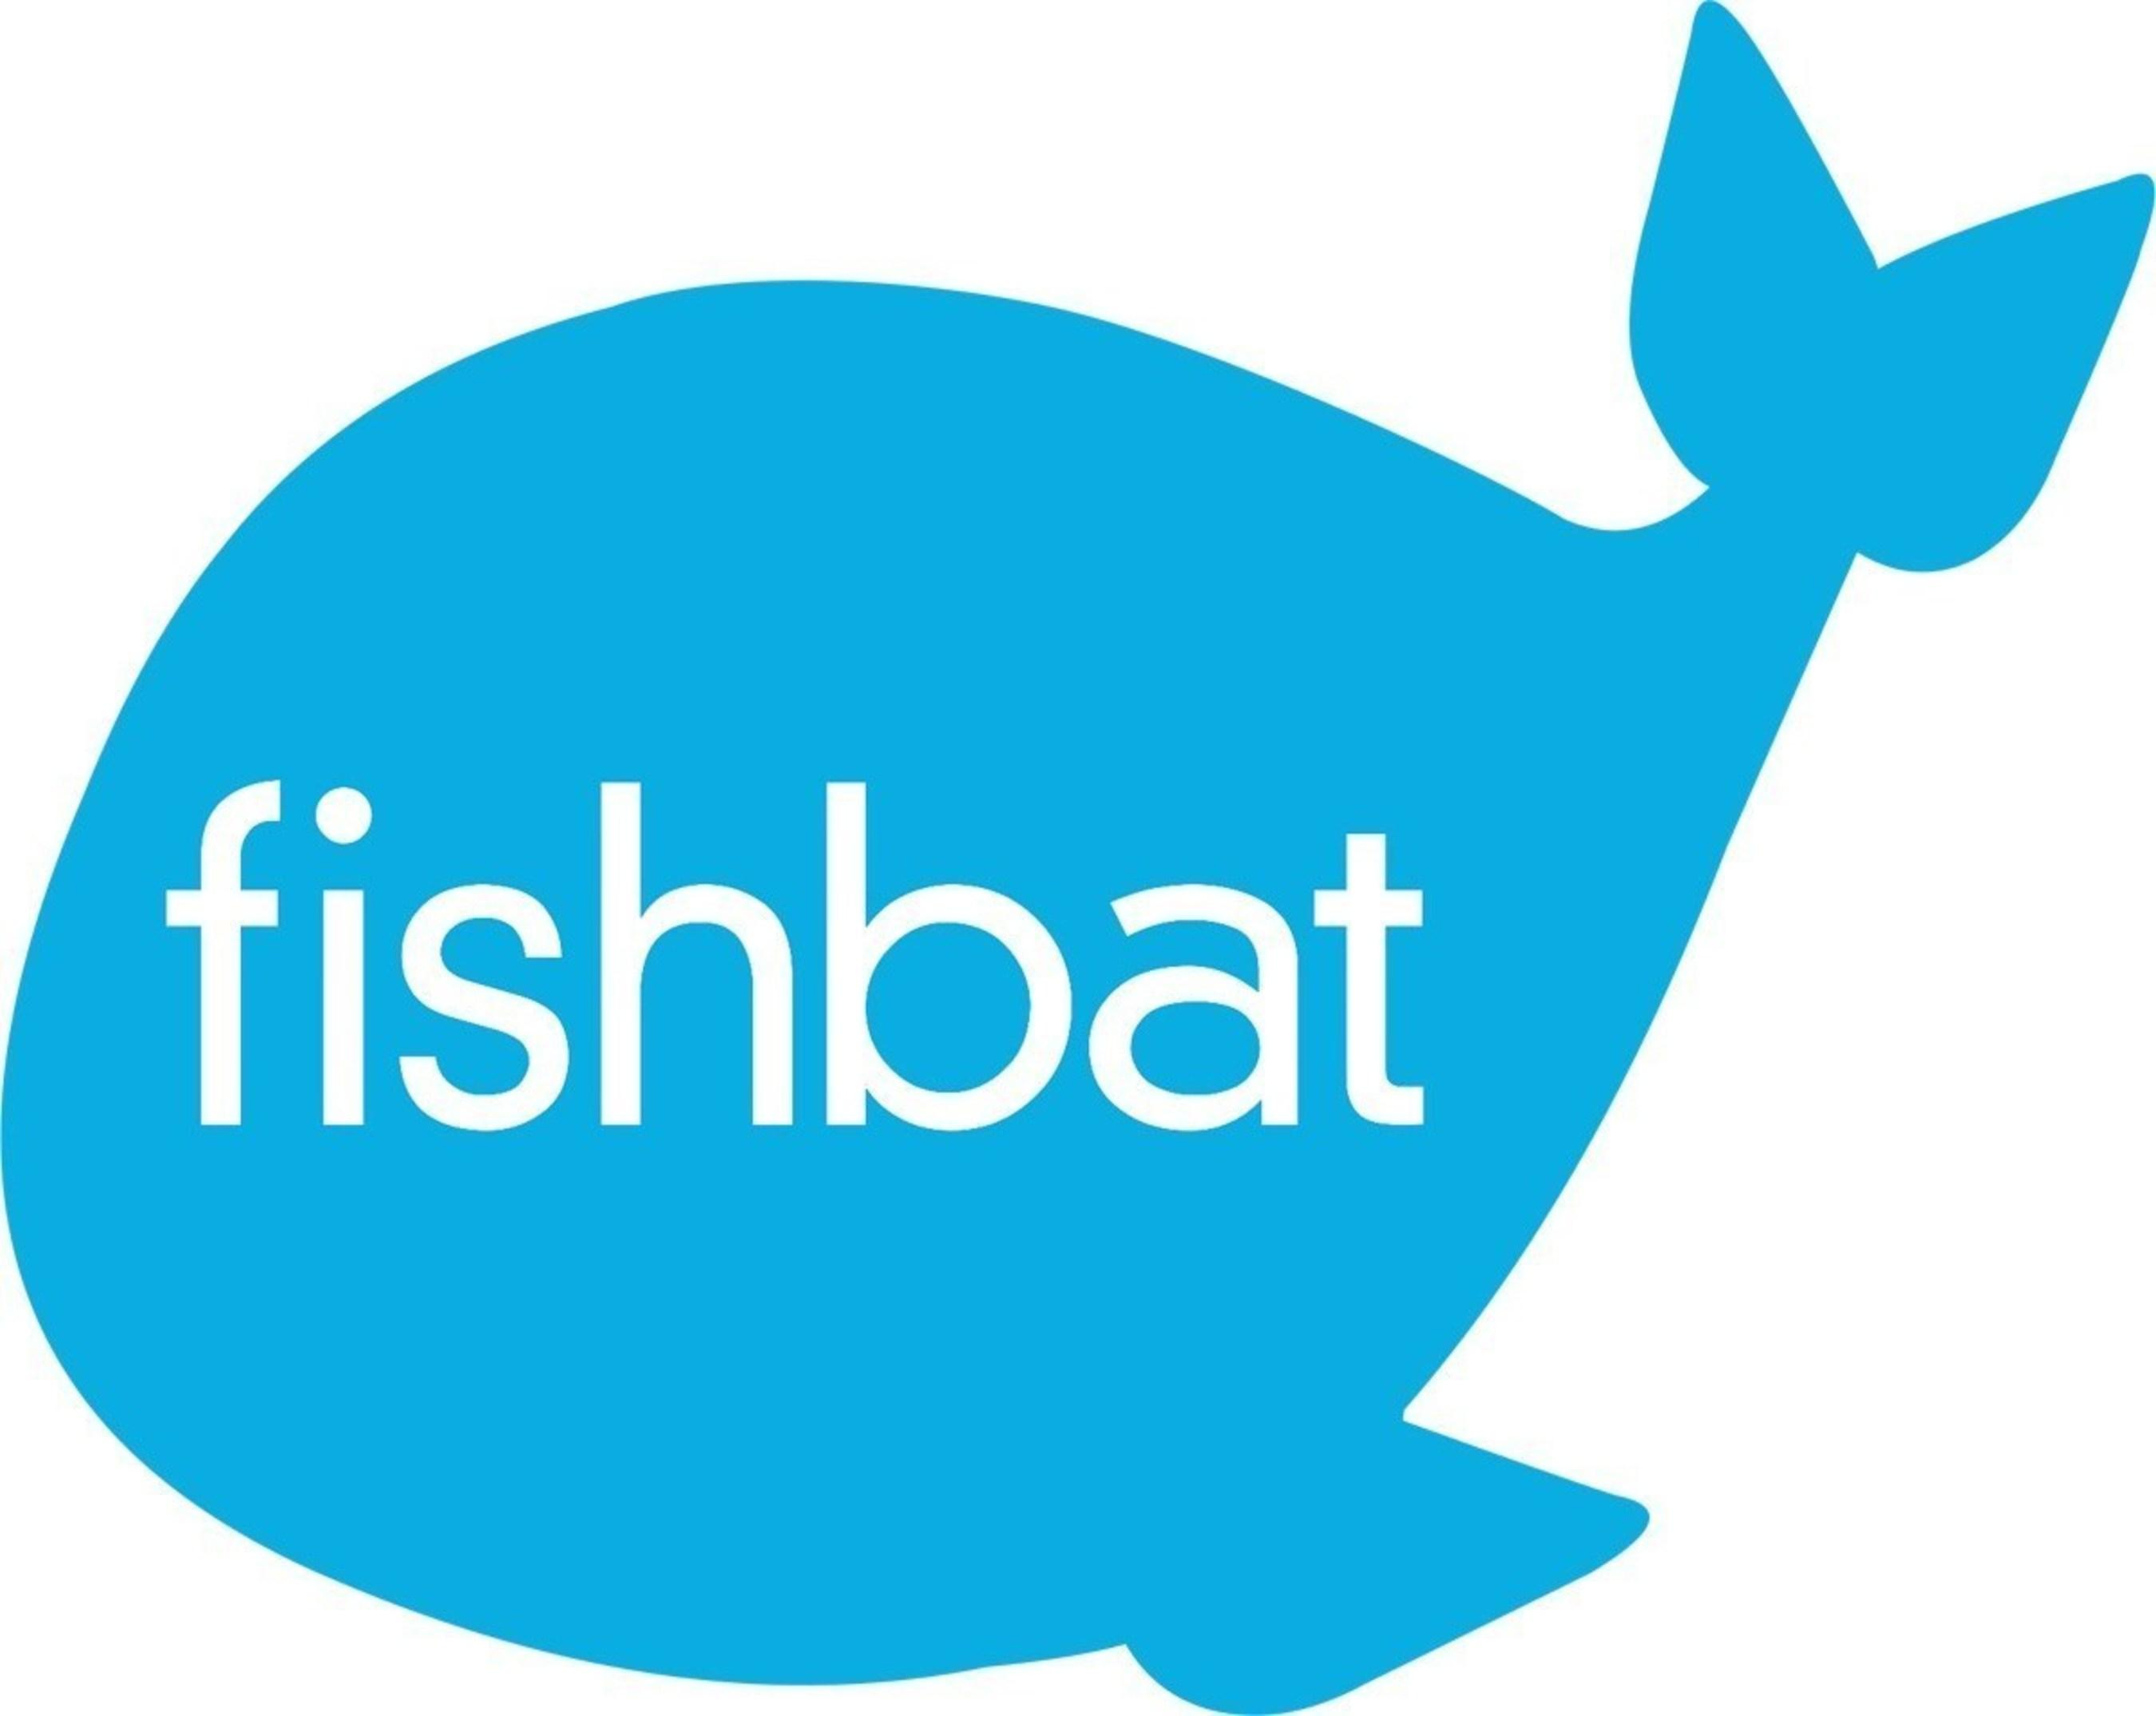 fishbat COO Scott Darrohn Offers Tips for Online Reputation Management